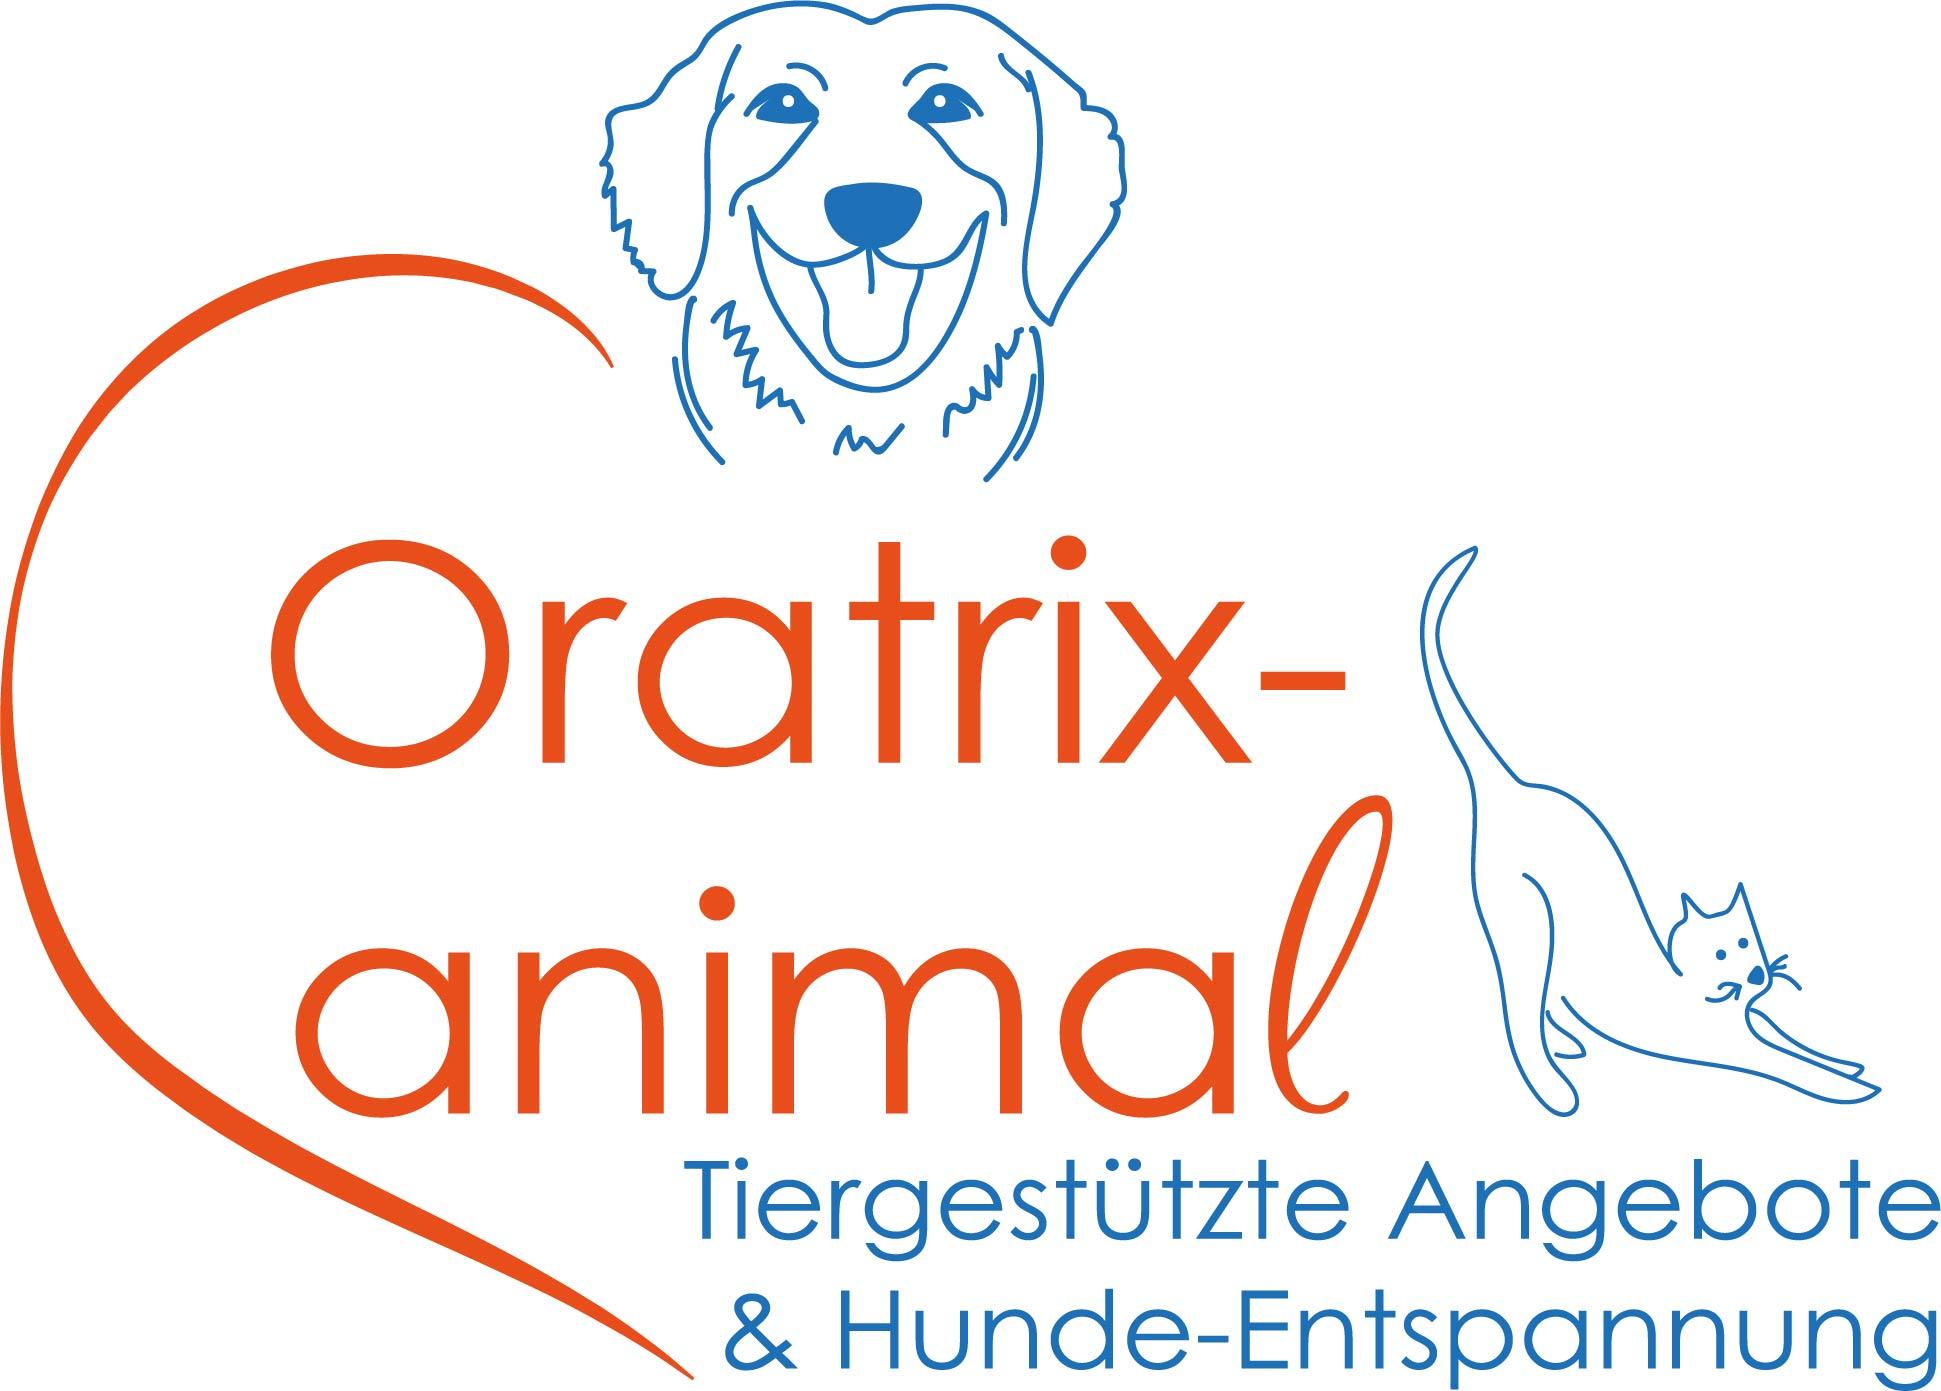 Oratrix-animal Logo